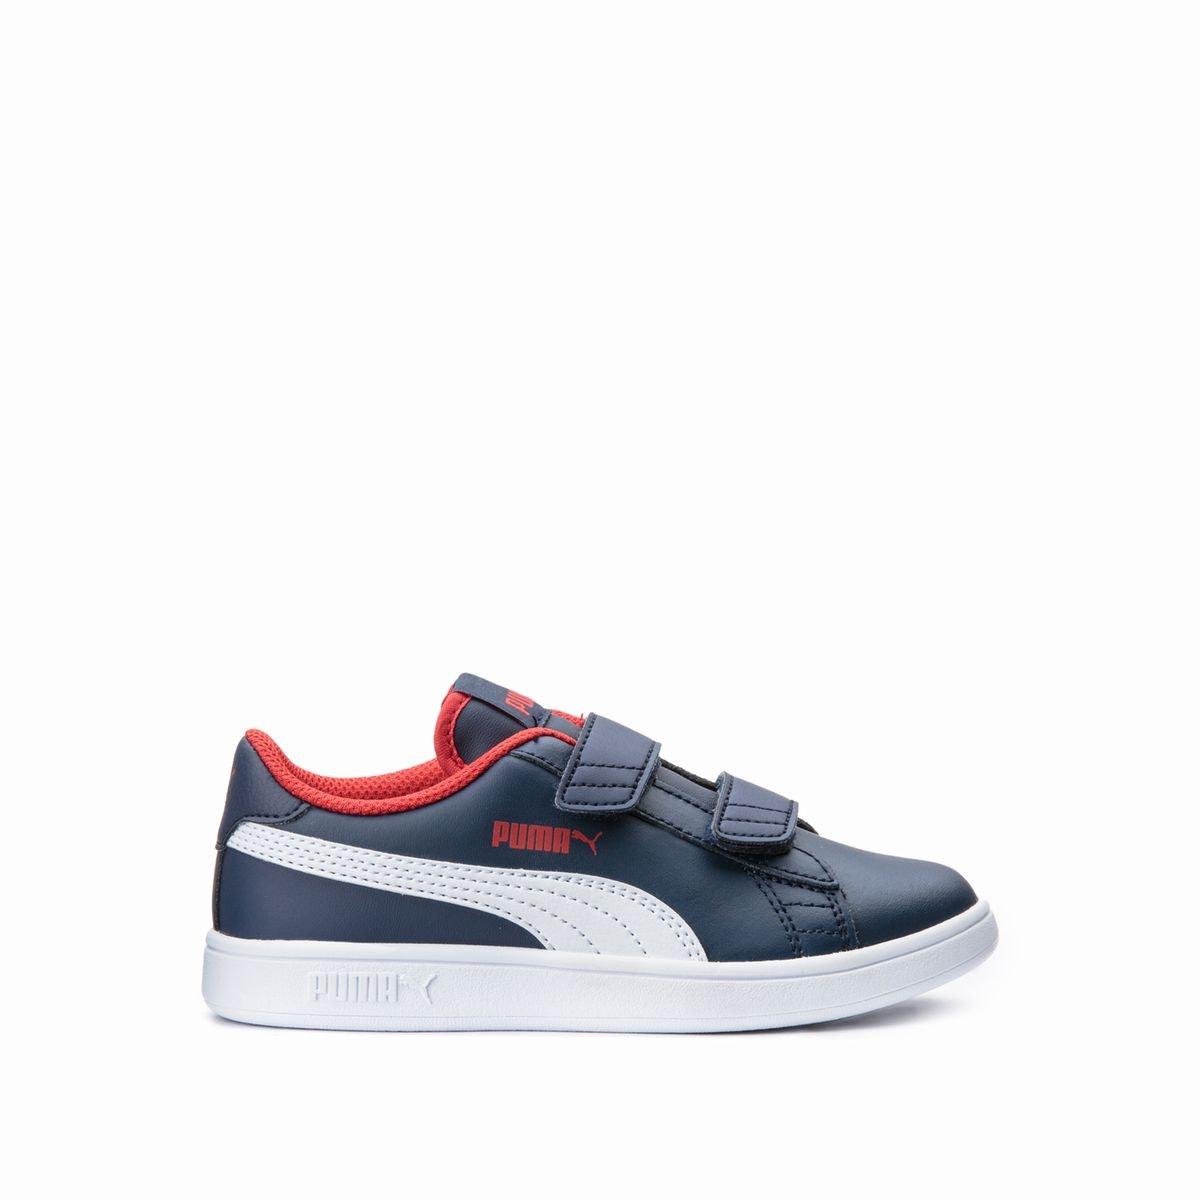 Chaussures garçon PUMA | La Redoute